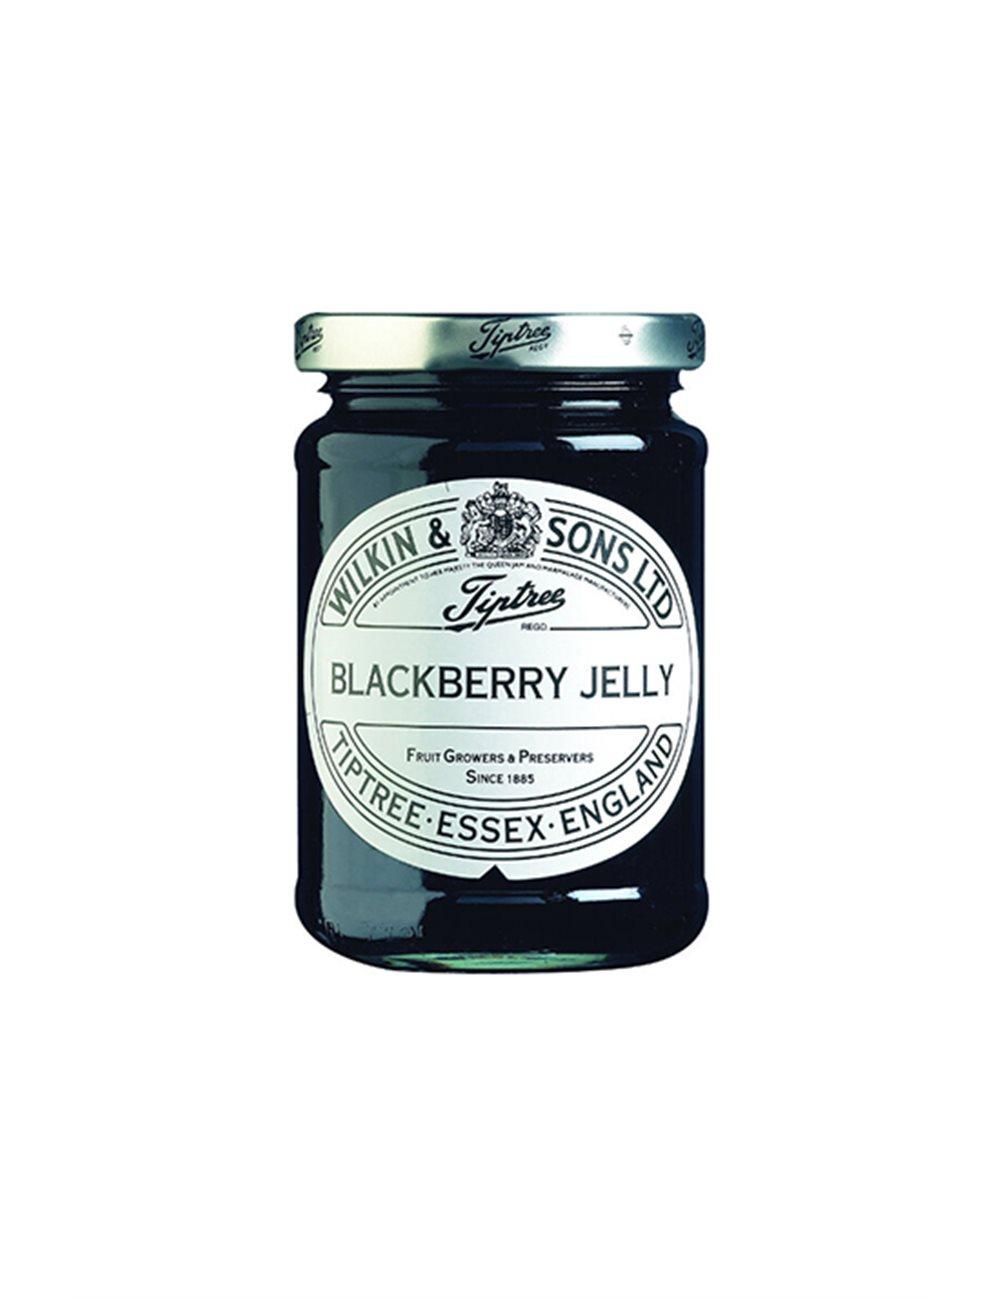 Blackberry Jelly 340g